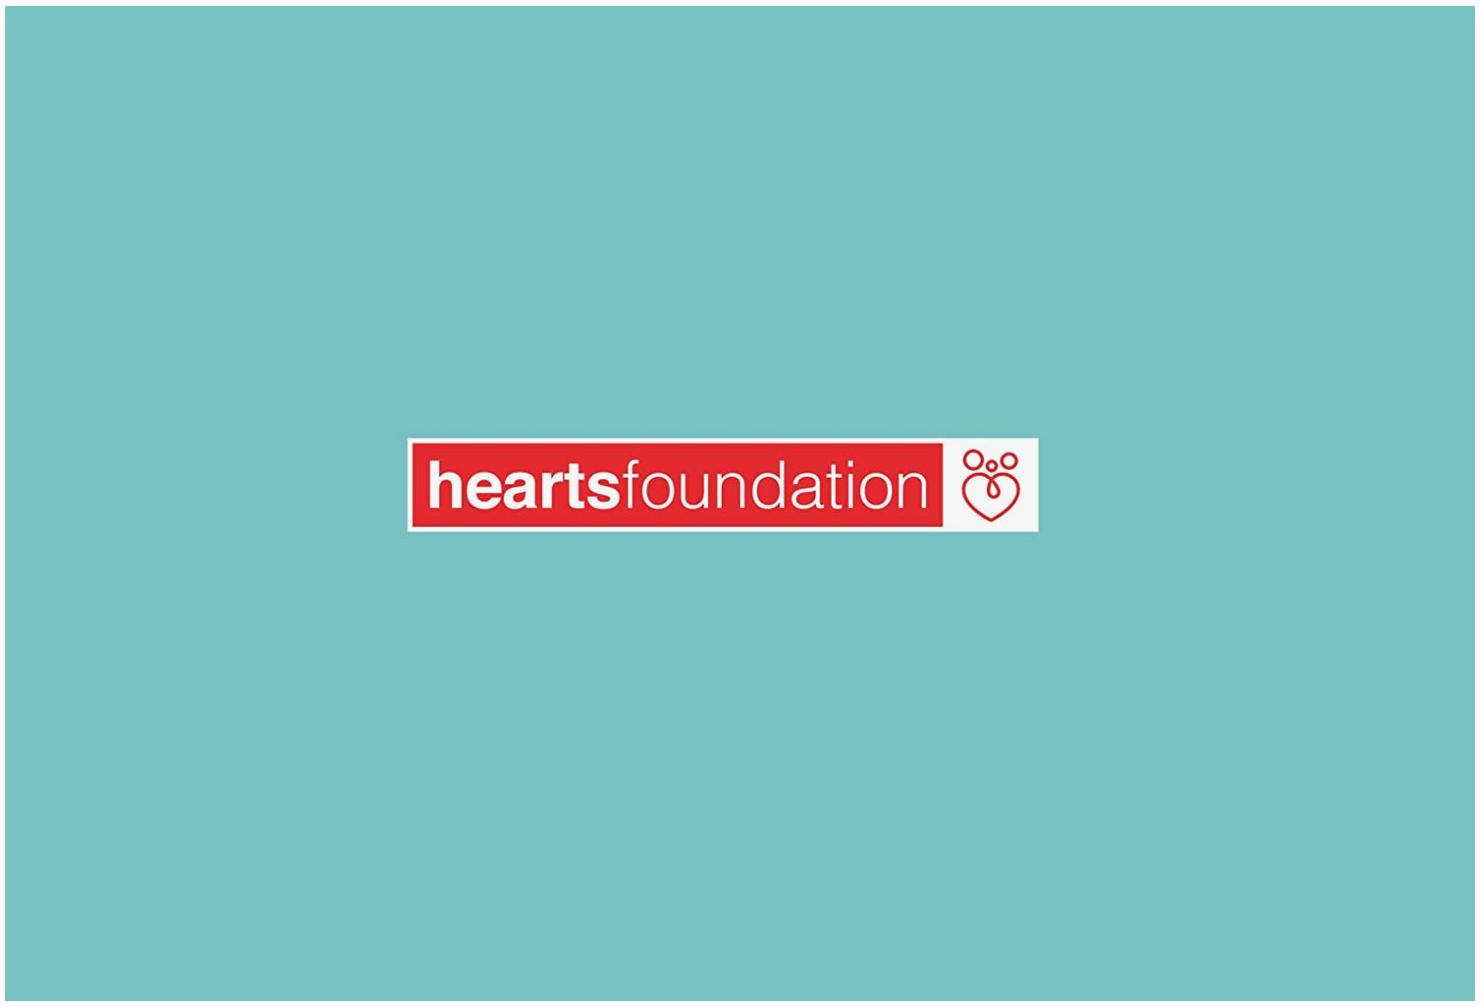 heartsfoundation